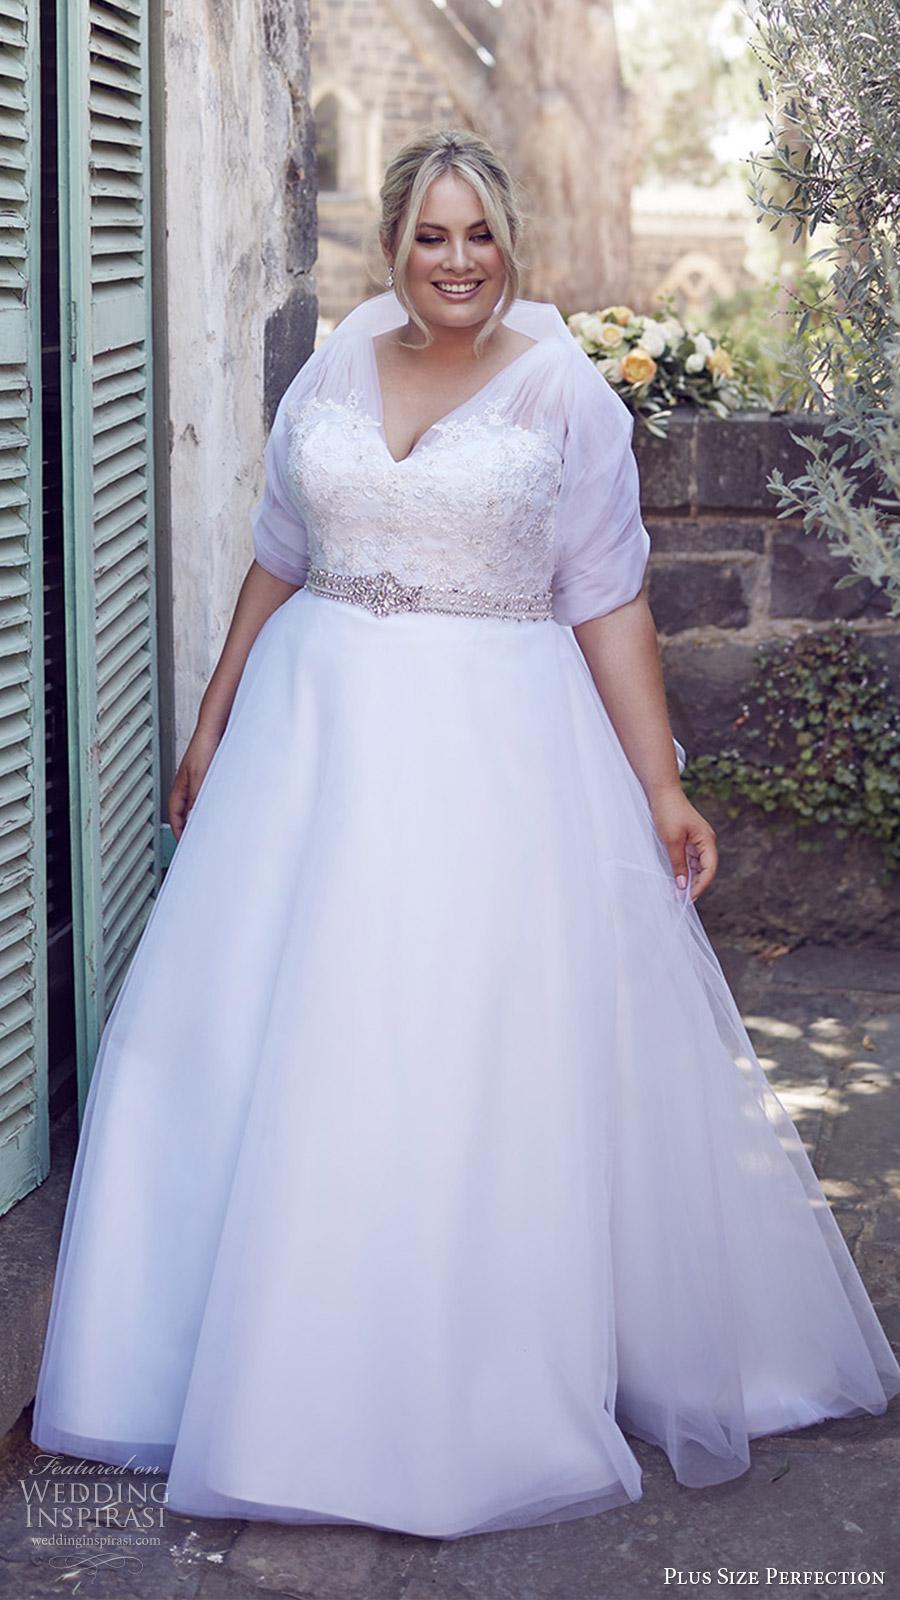 plus size perfection bridal 2016 sleeveles thick straps vneck lace bodice a line wedding dress (felicity) fv romantic elegant wrap